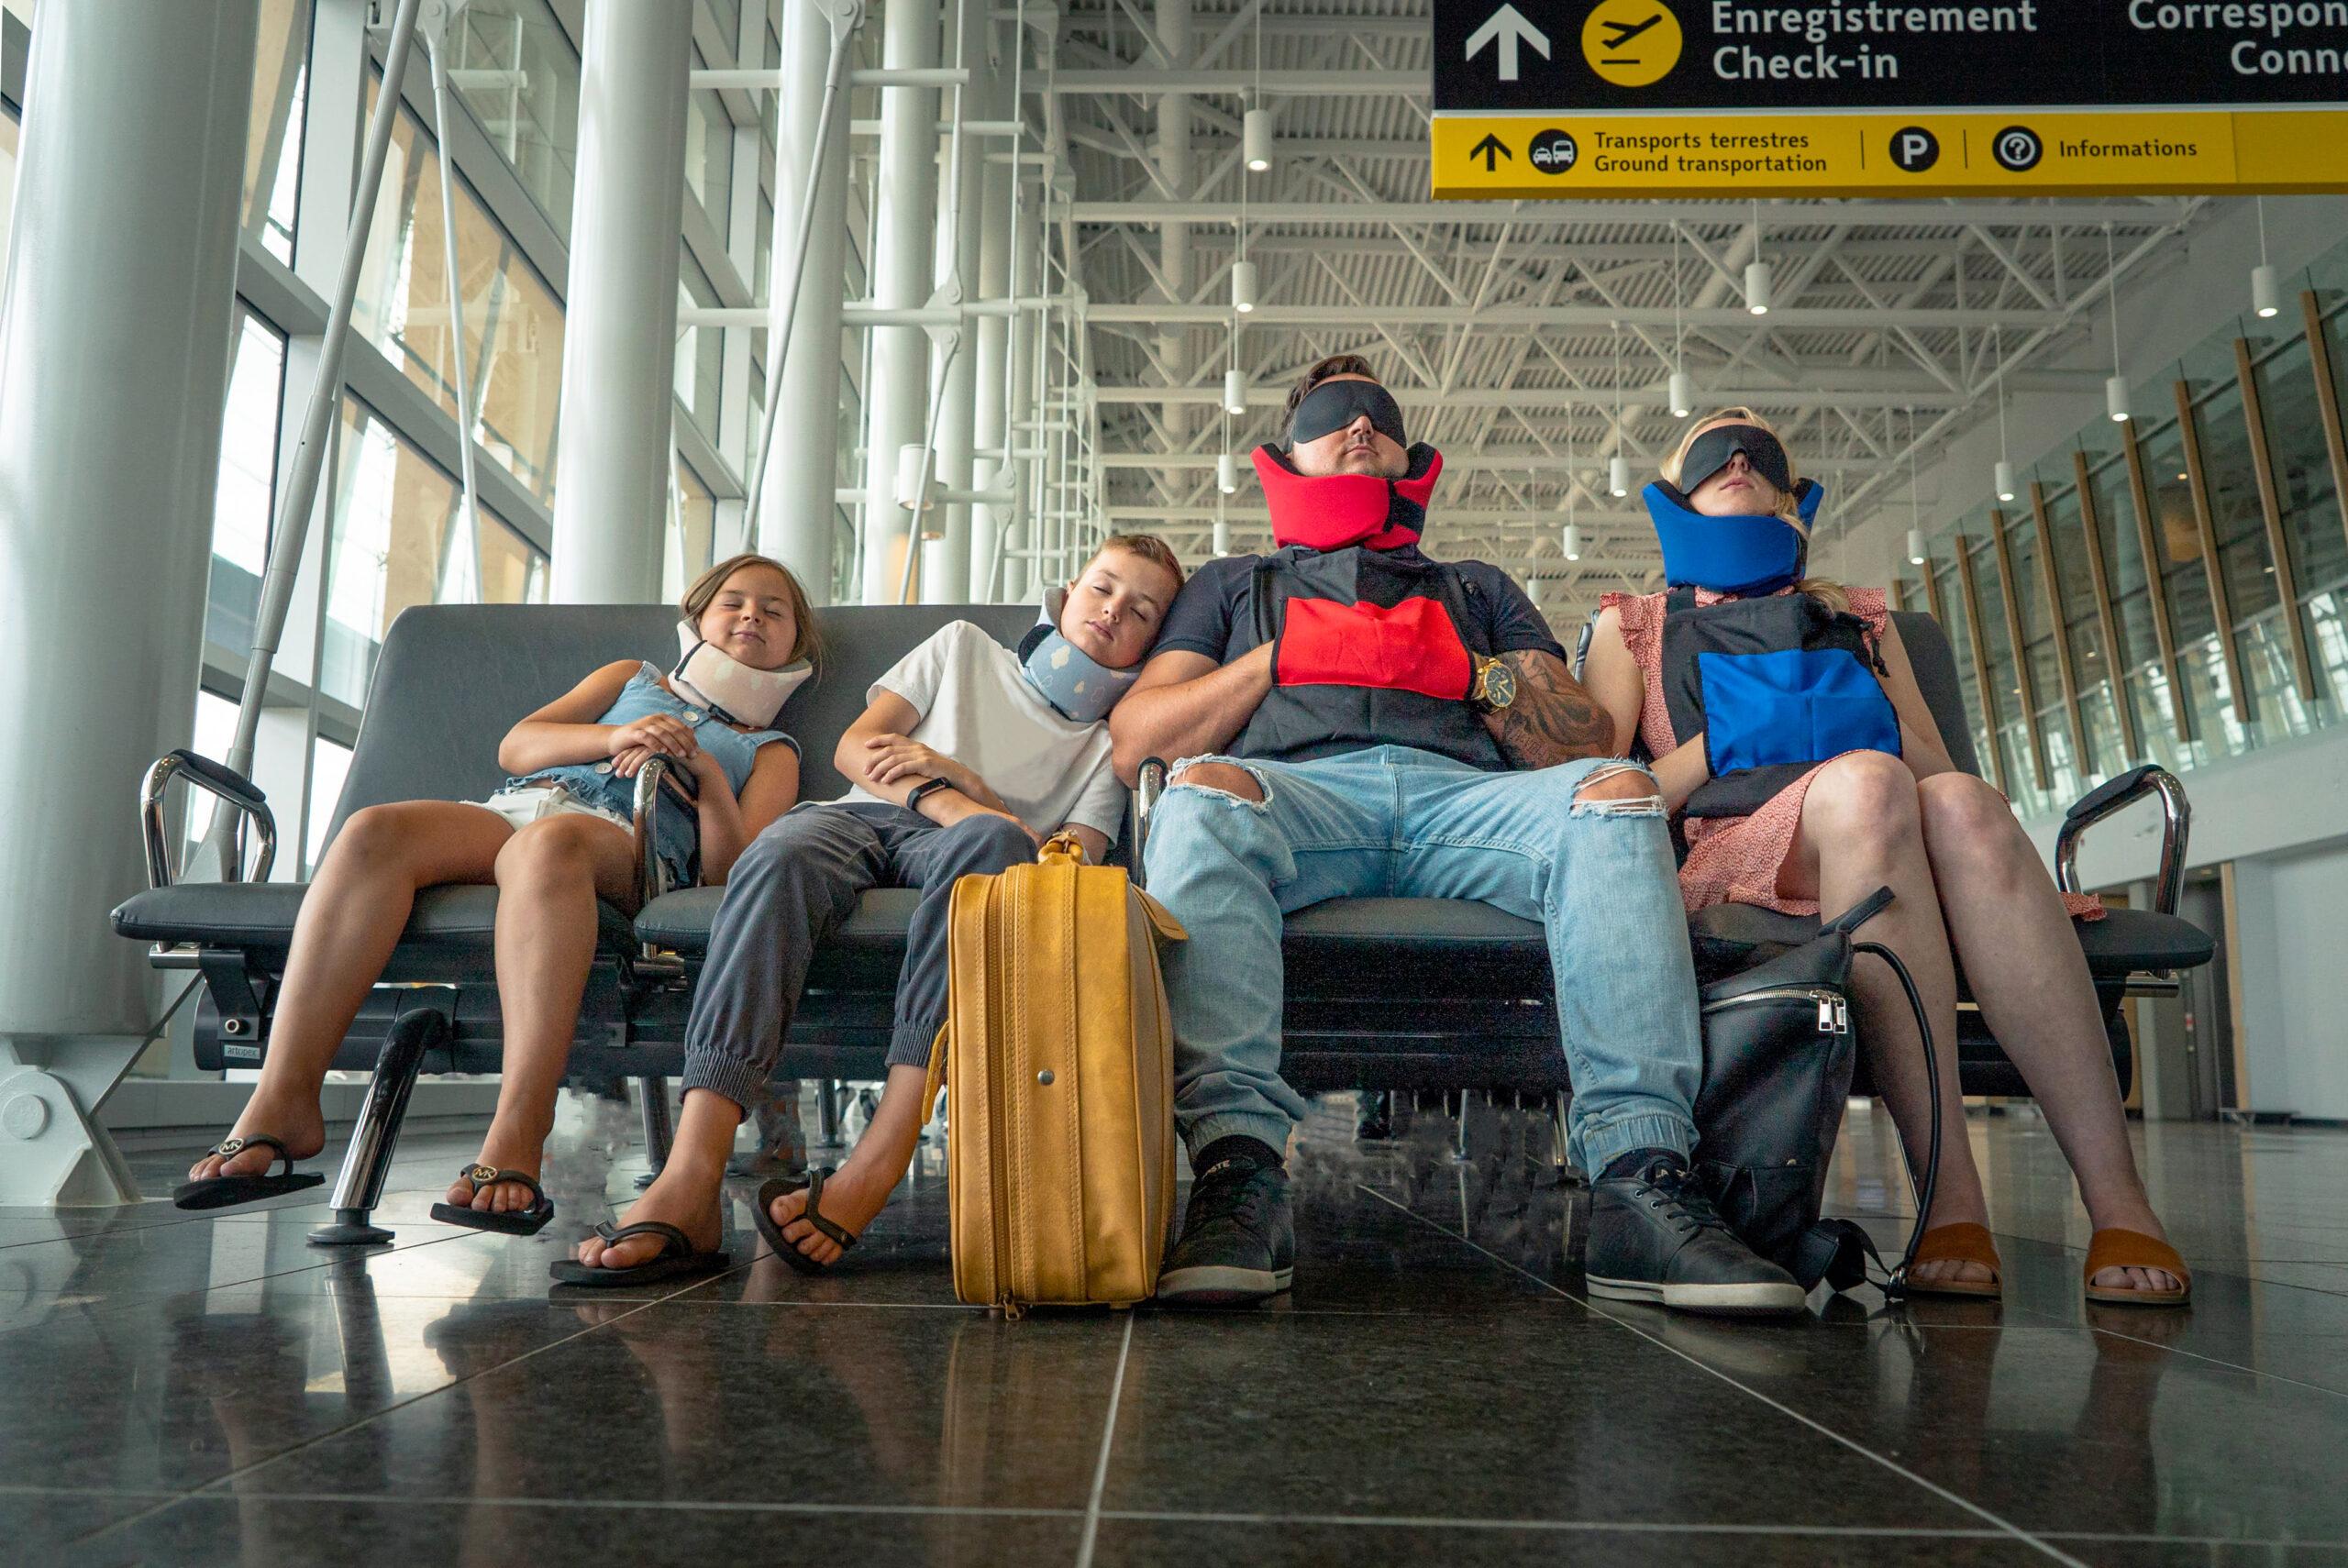 Airport - 1